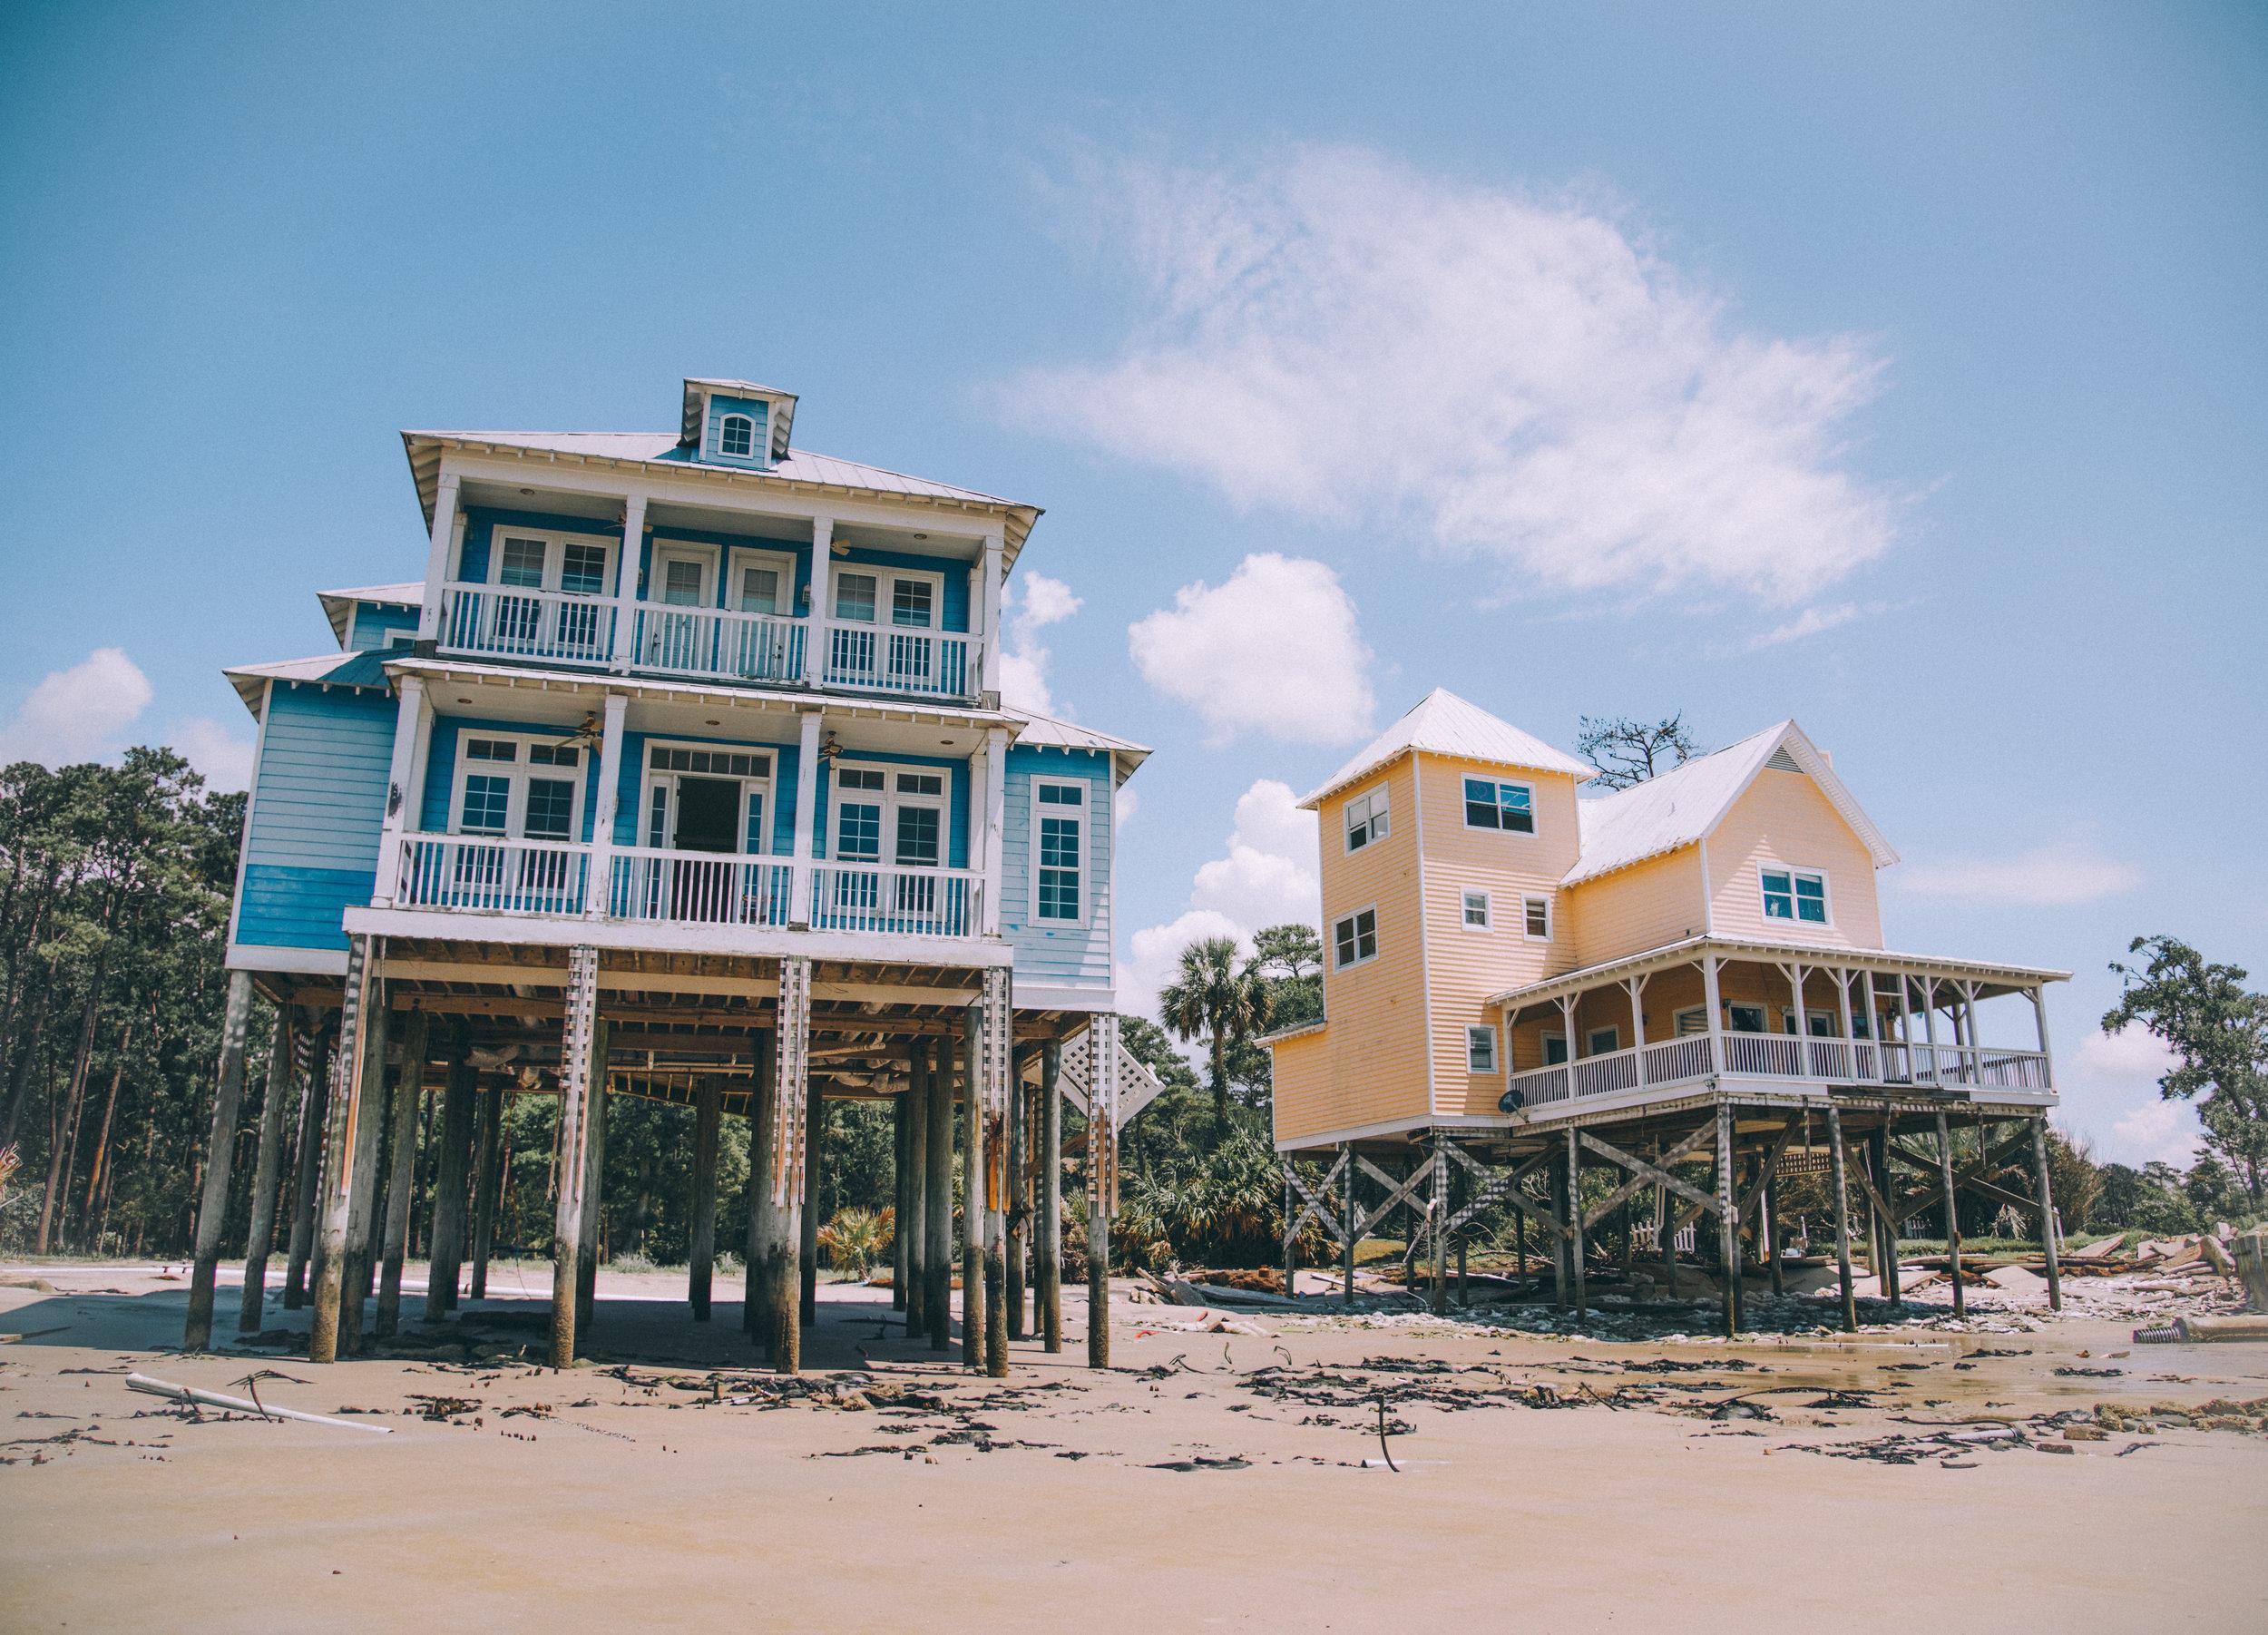 kw-abandoned-beachfront-homes-sc-img3.jpg